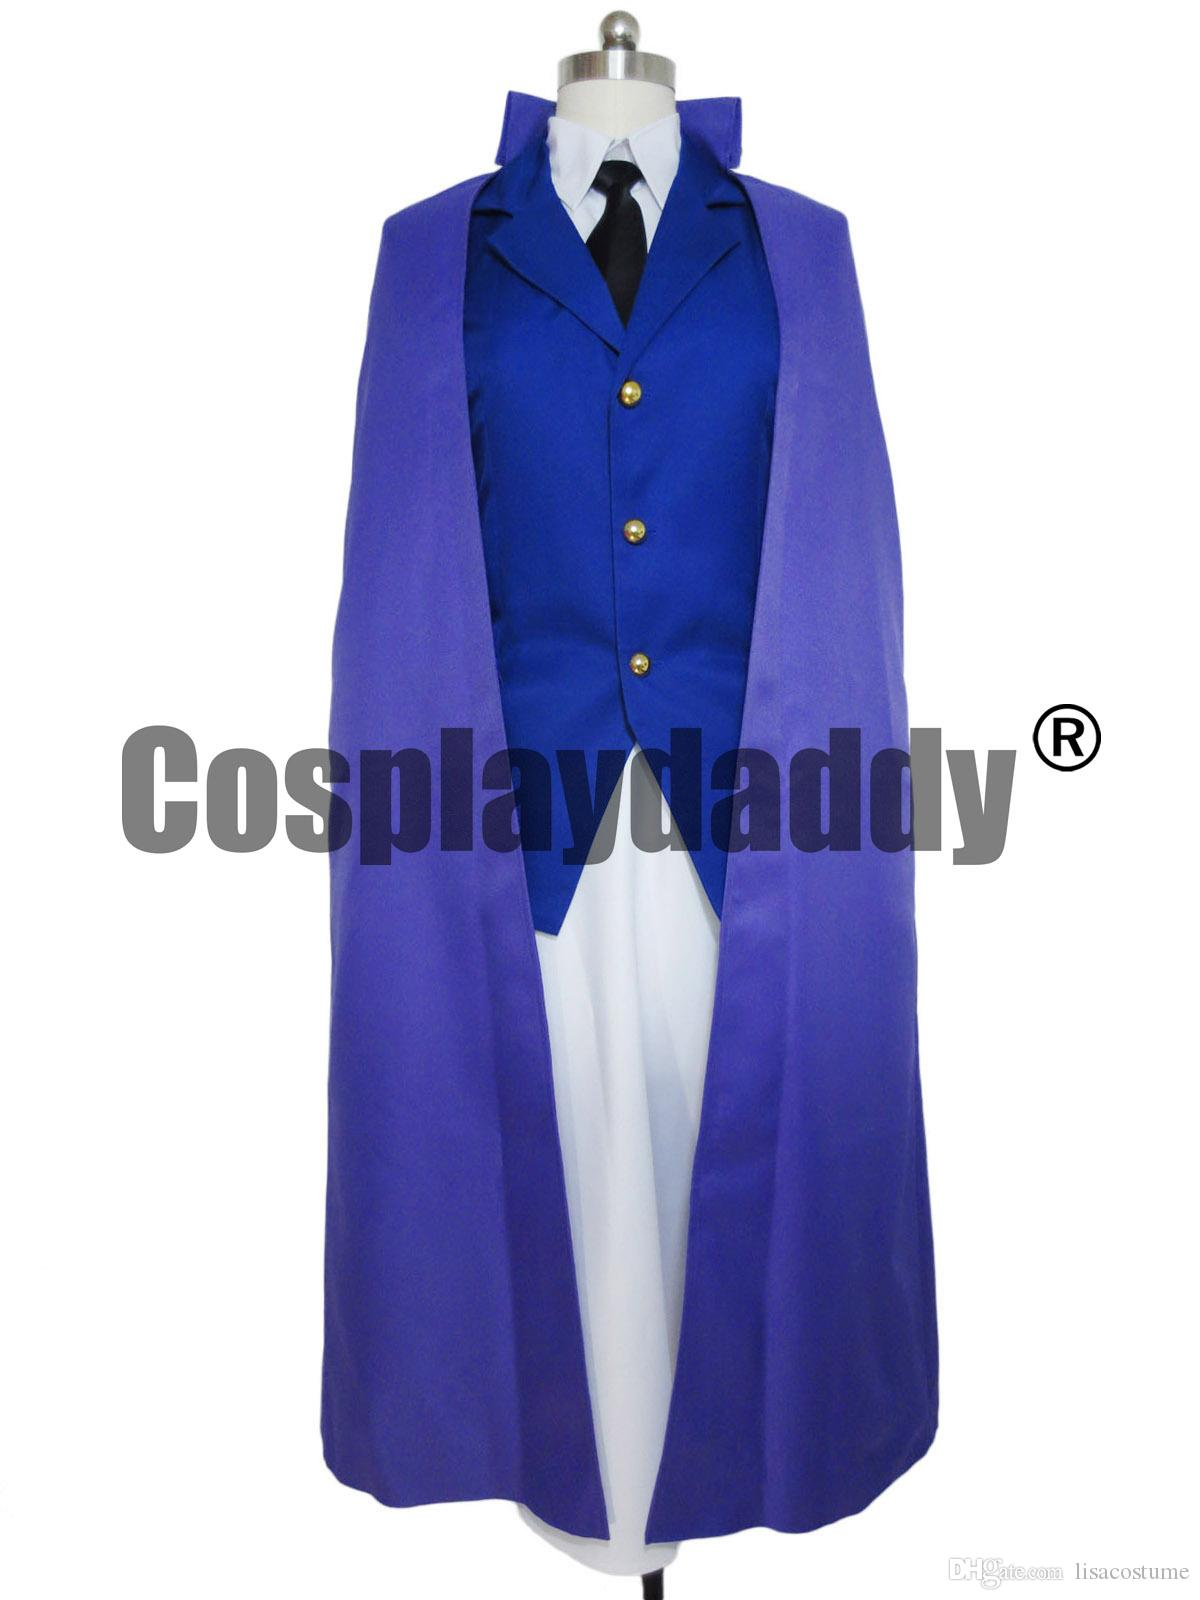 Axis Powers Hetalia Cosplay Nyotalia France Female Dress H008